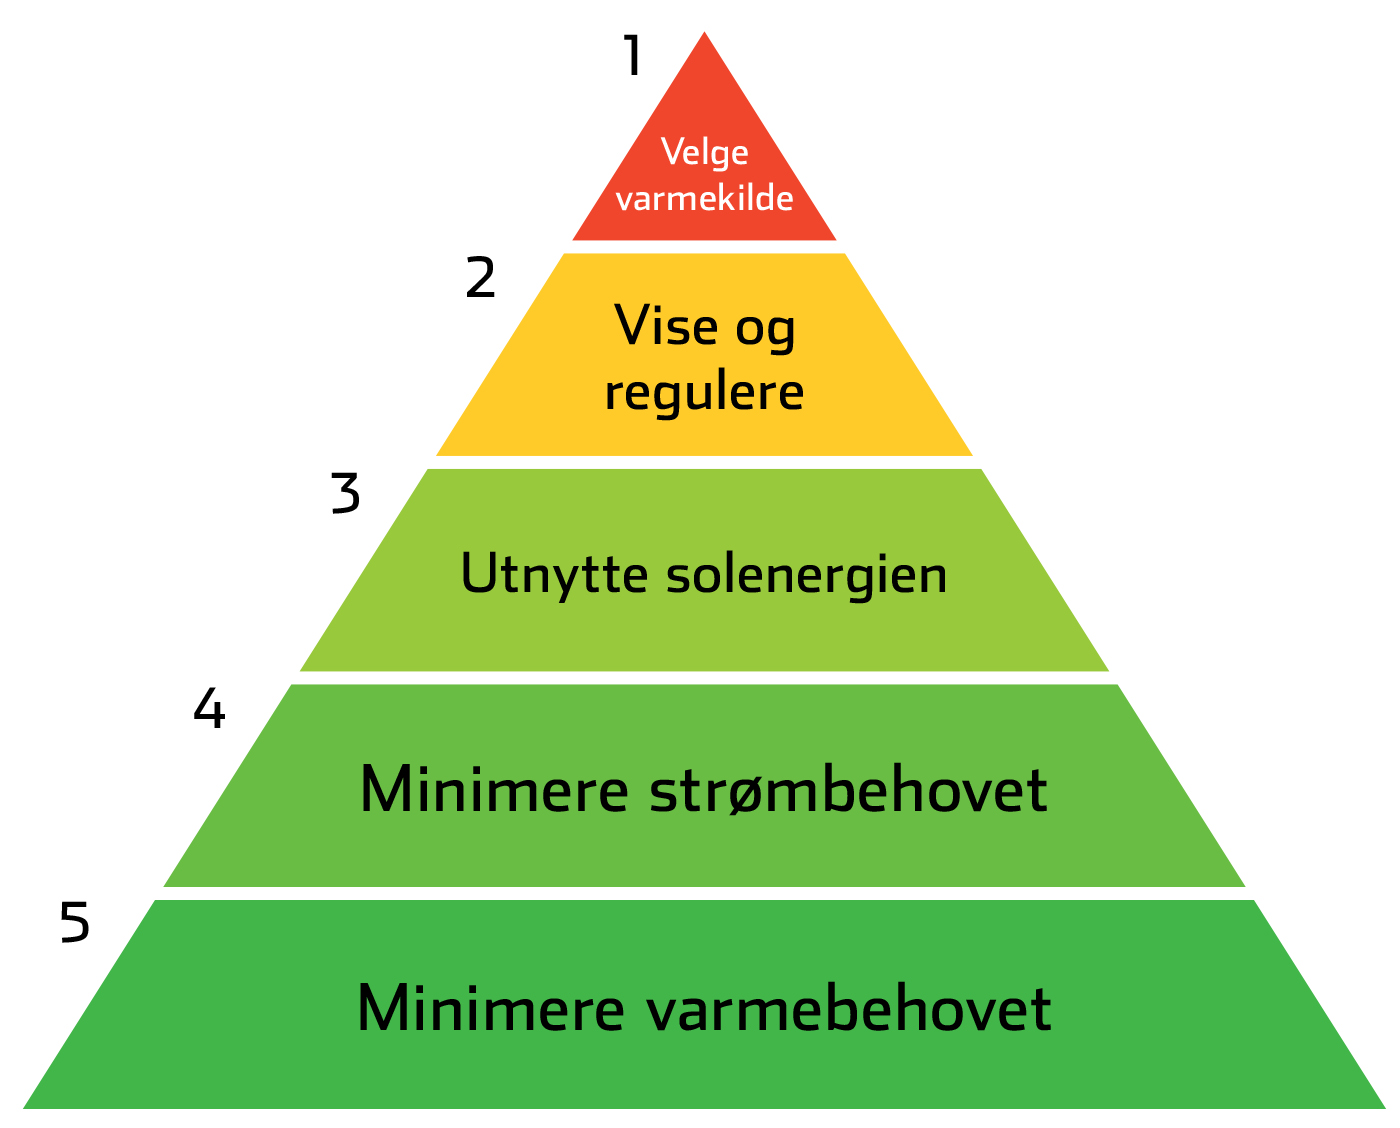 kyotopyramiden